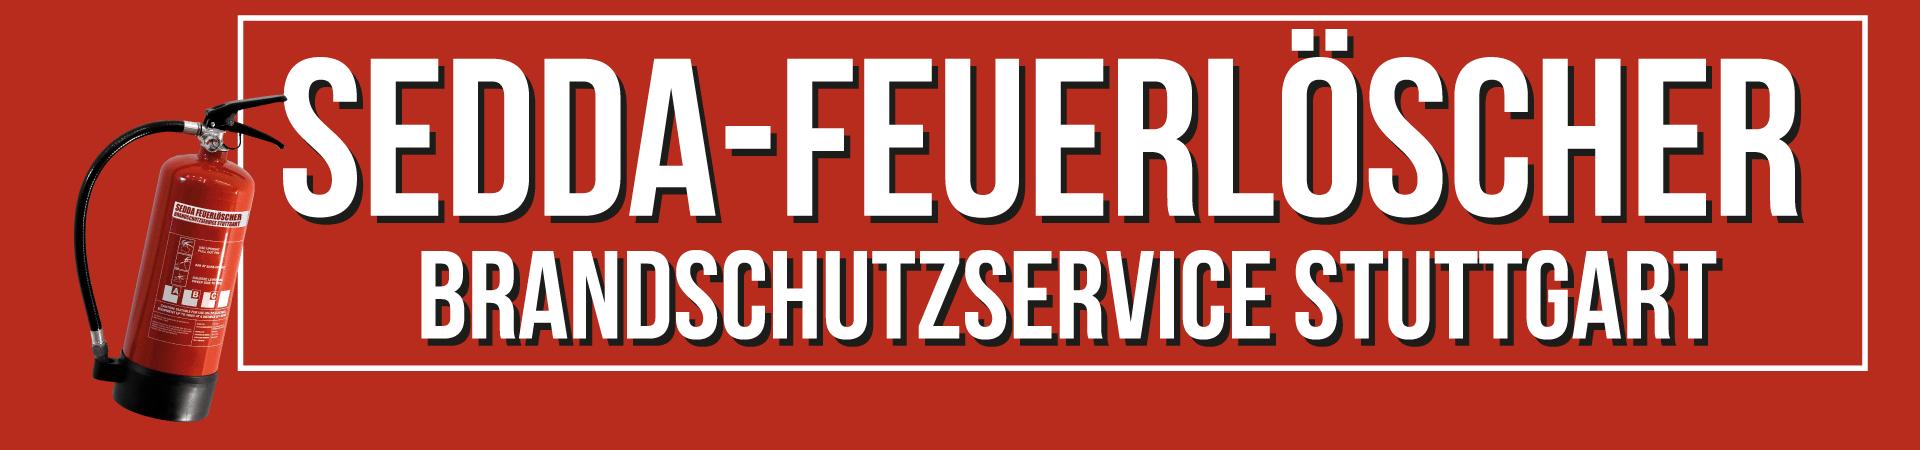 brandschutzservice